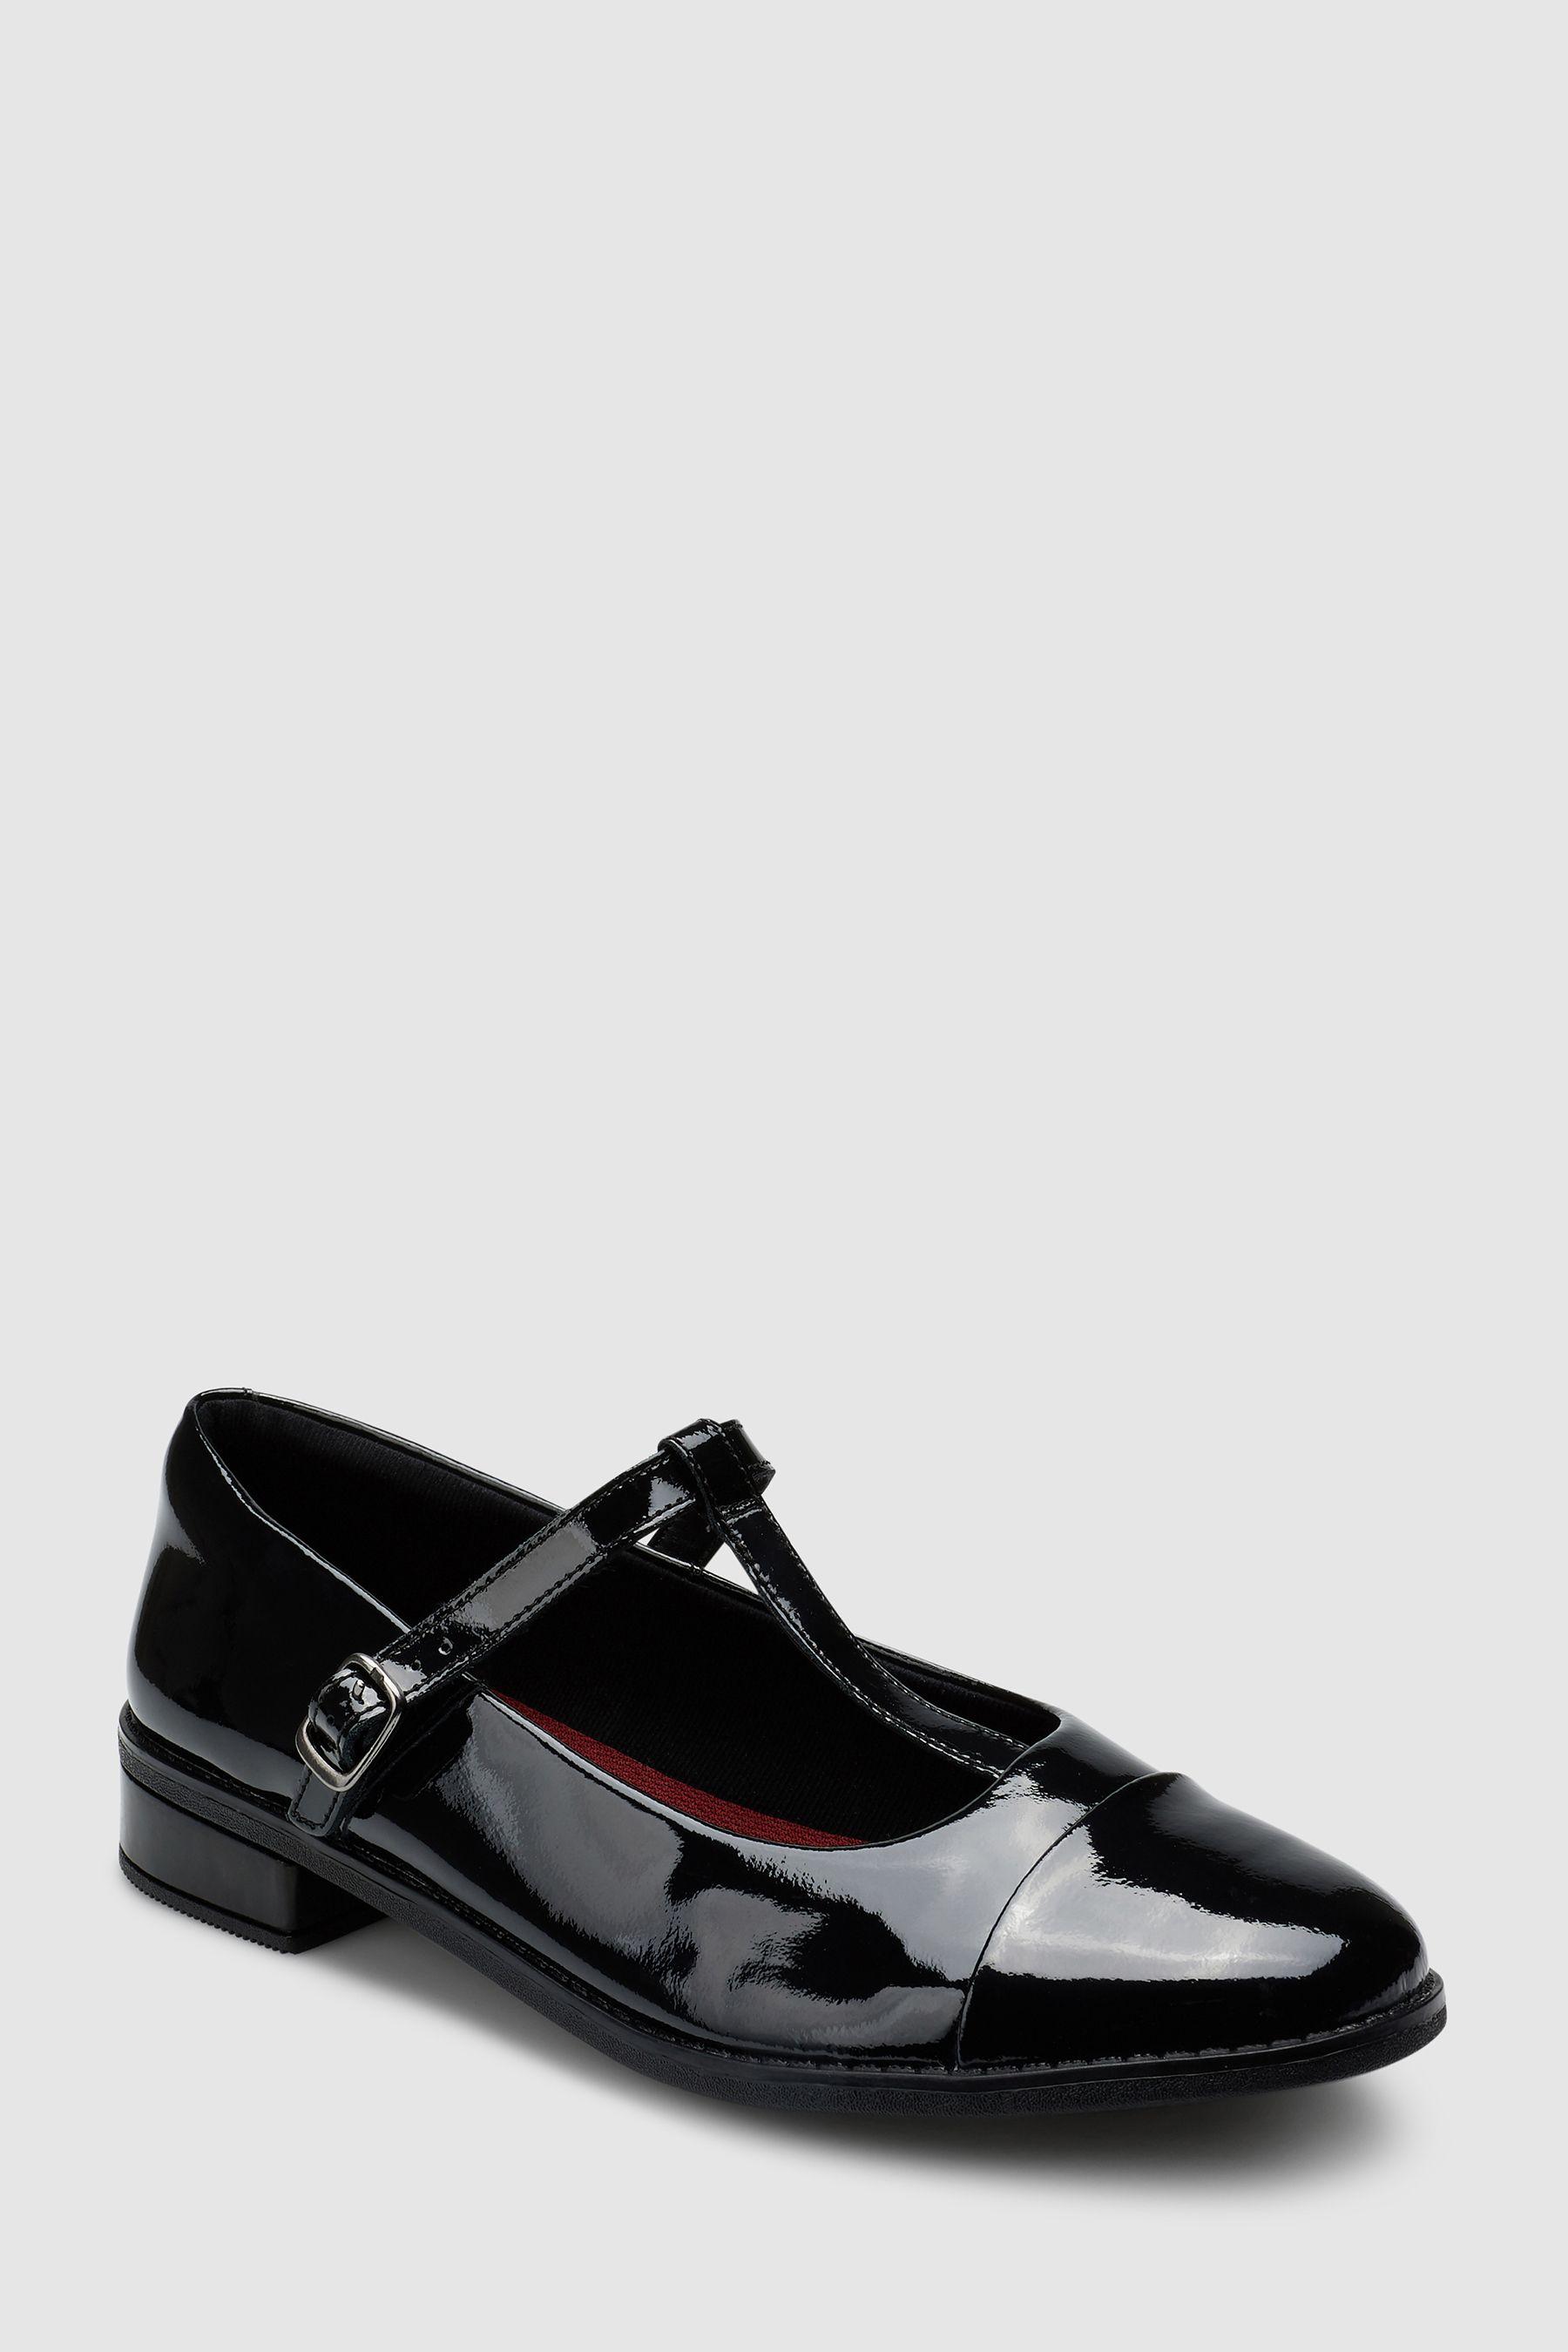 b0d8904d7f6 Girls Clarks Black Patent Drew Shine T-Bar Youth Shoe - Black ...